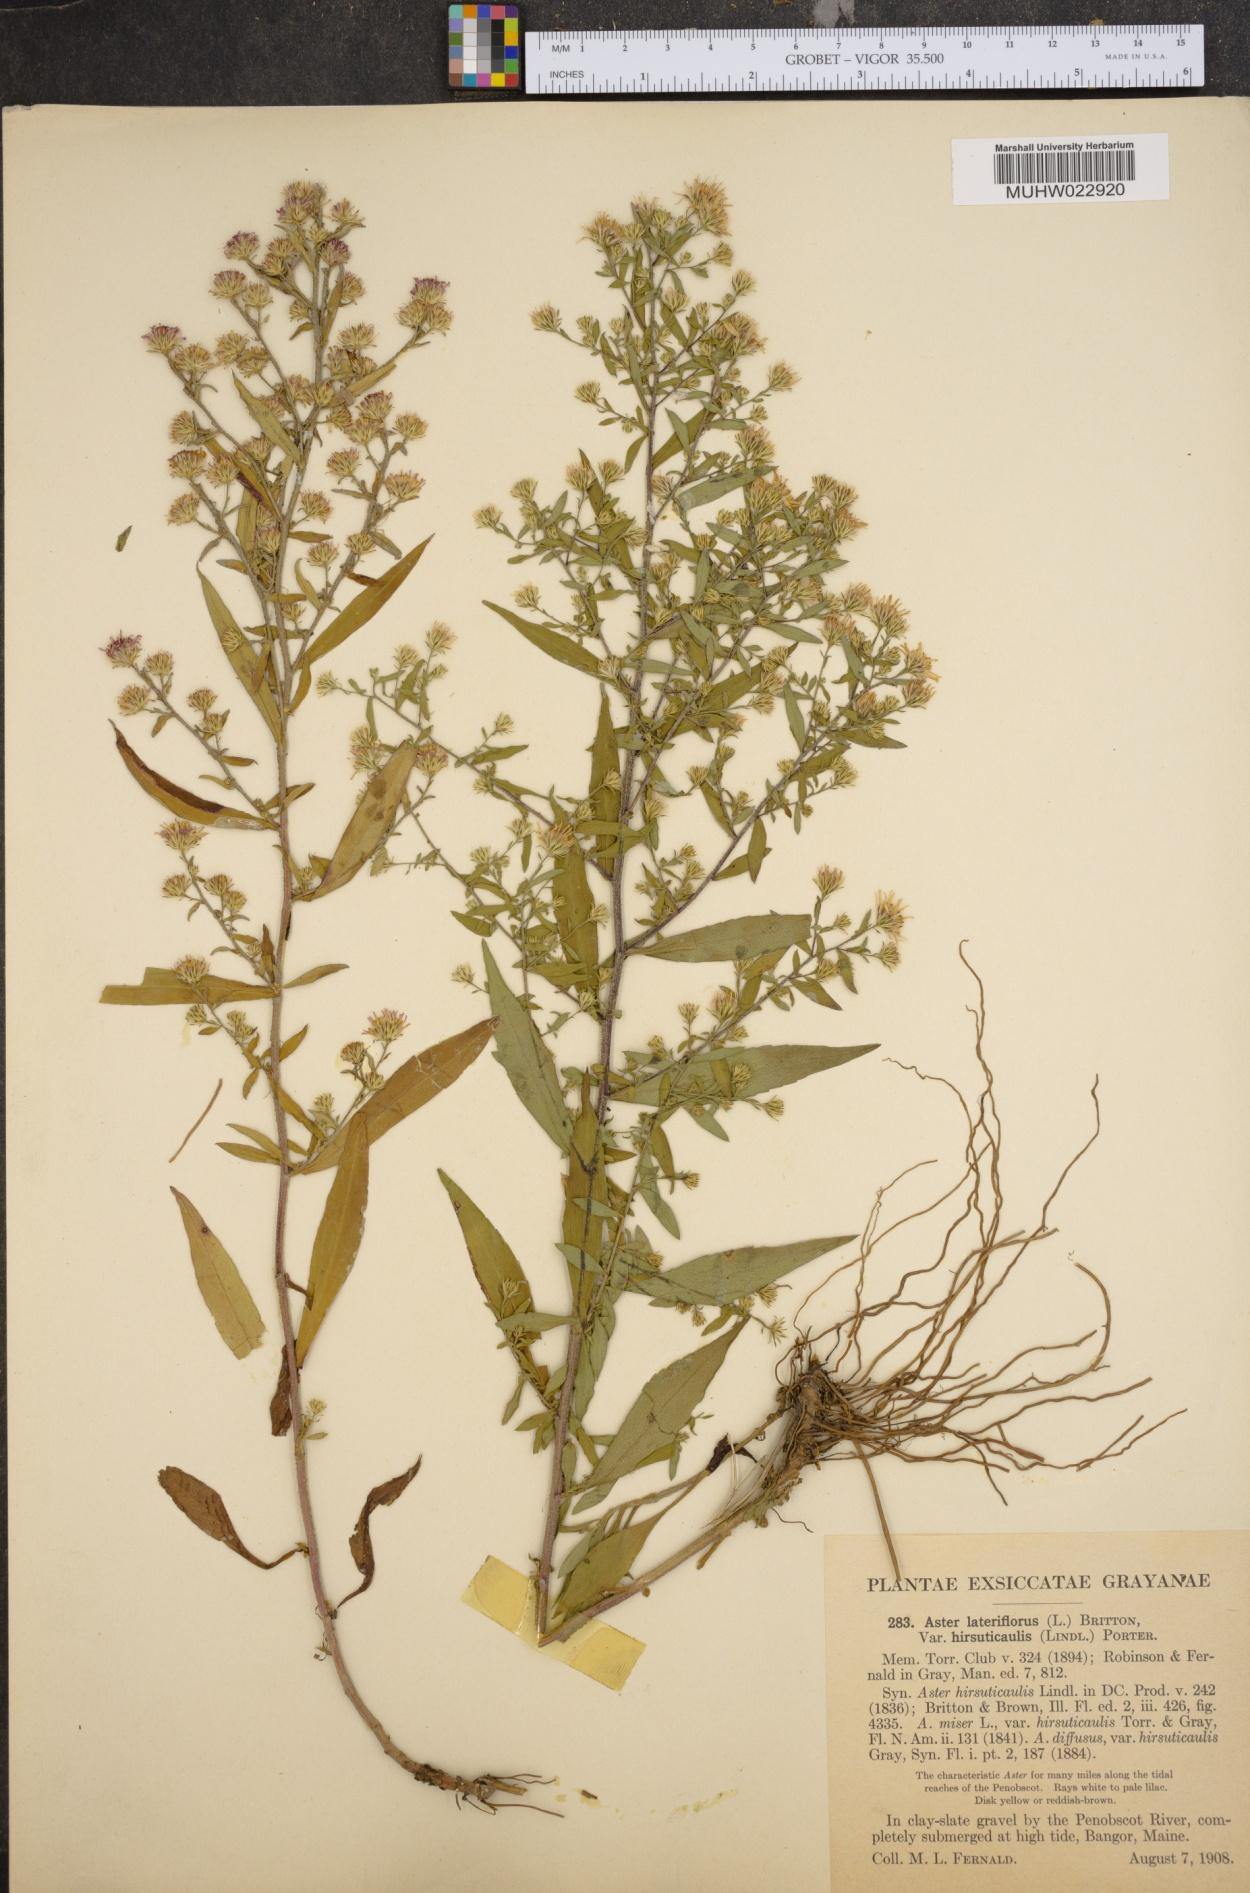 Symphyotrichum lateriflorum var. hirsuticaule image